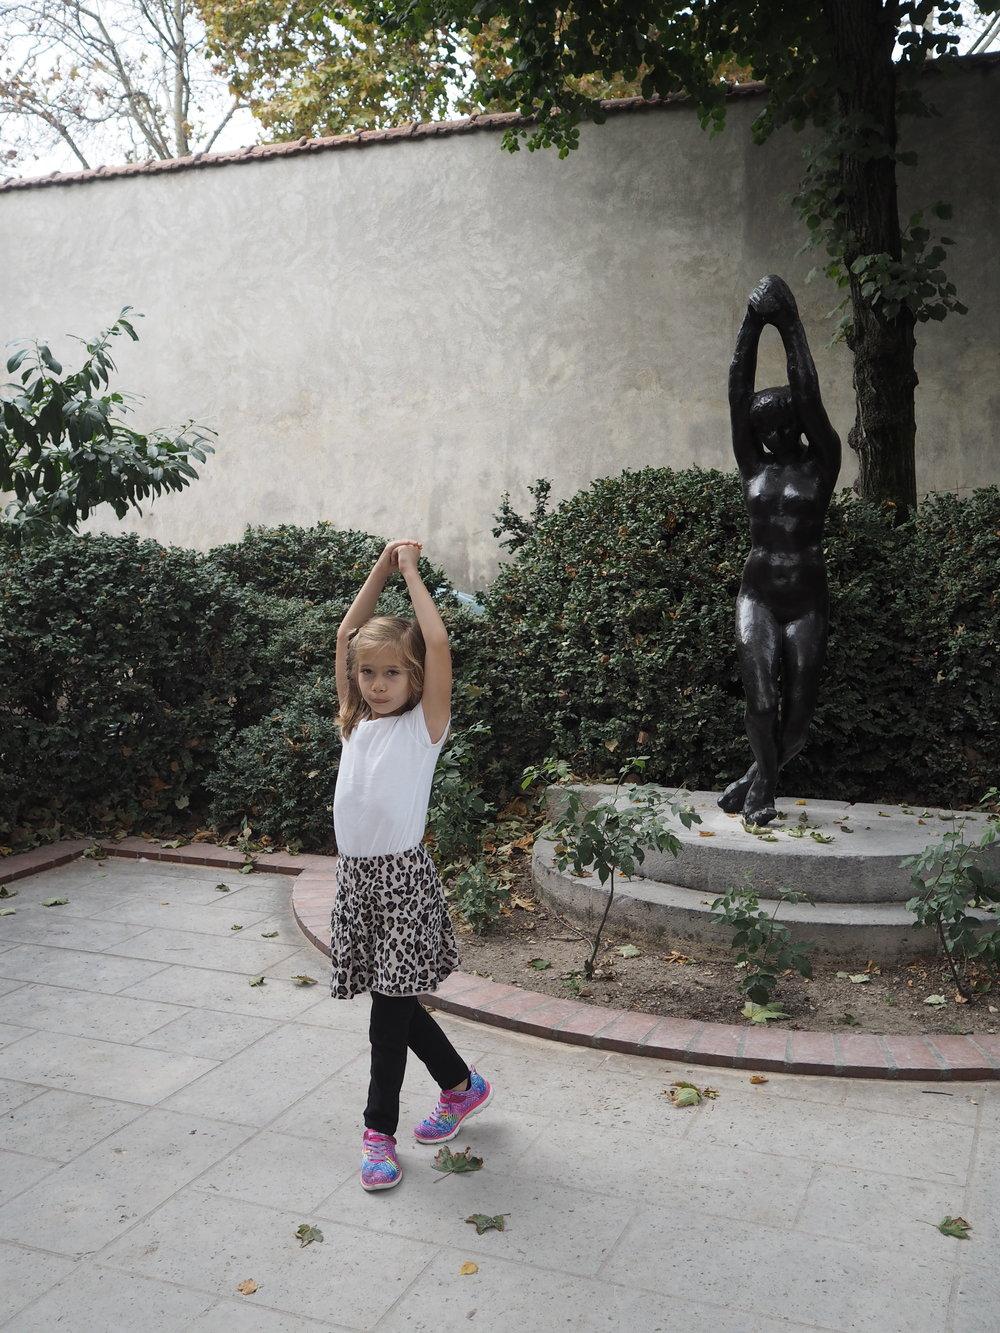 ballerina gi-irrrrrrl!